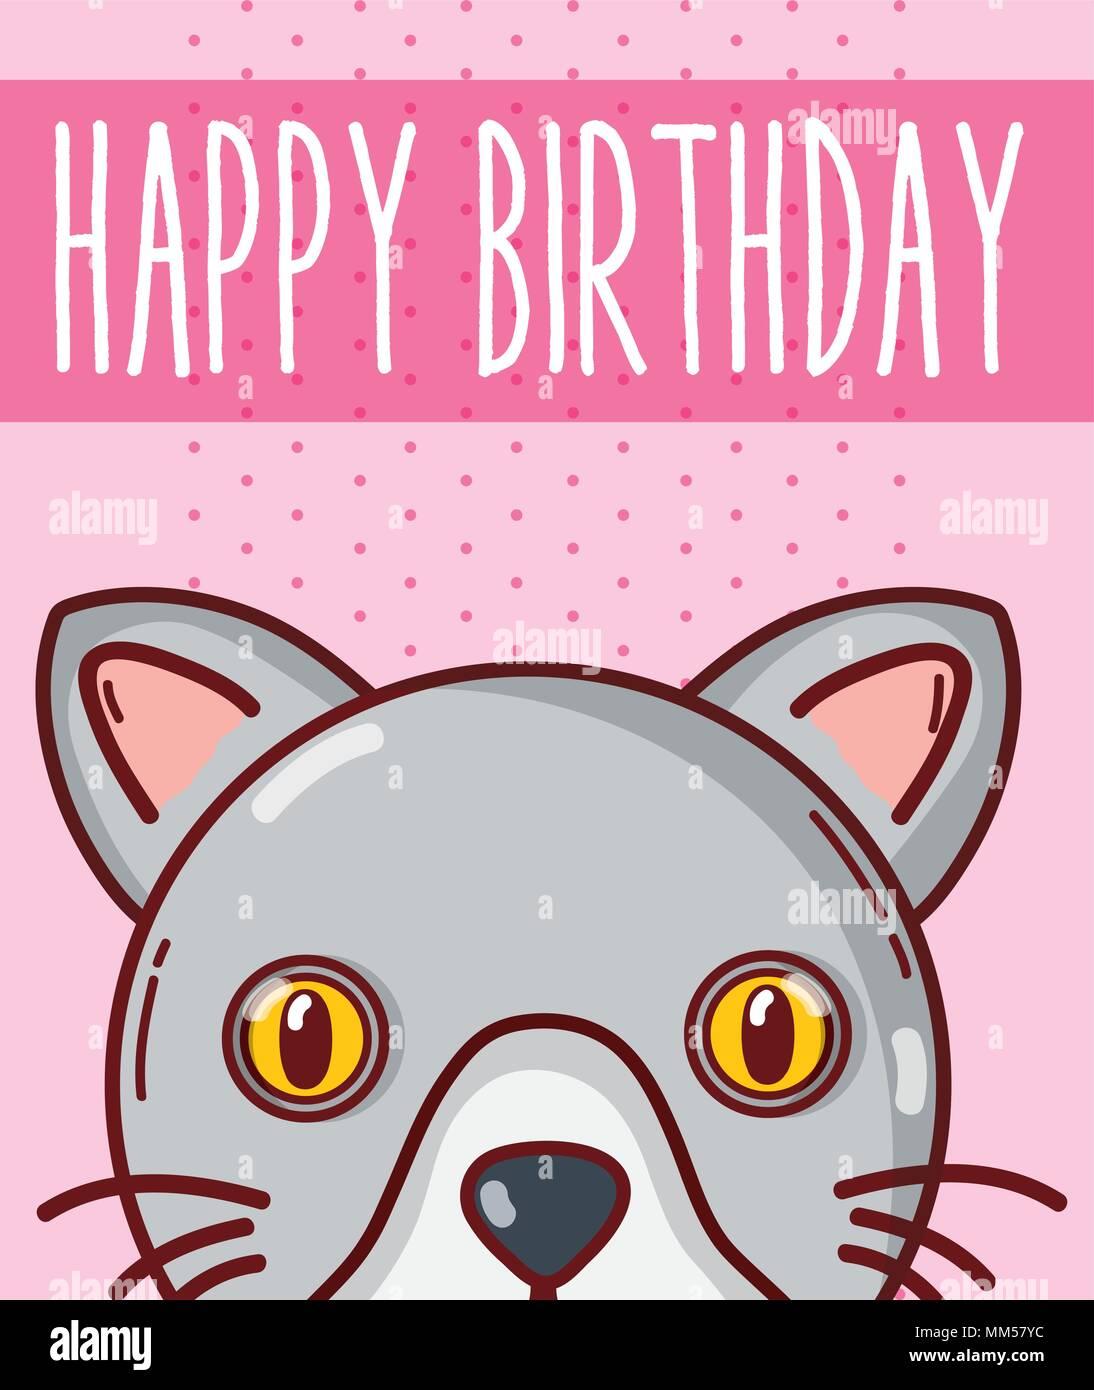 Happy birthday card with animal cartoon - Stock Image